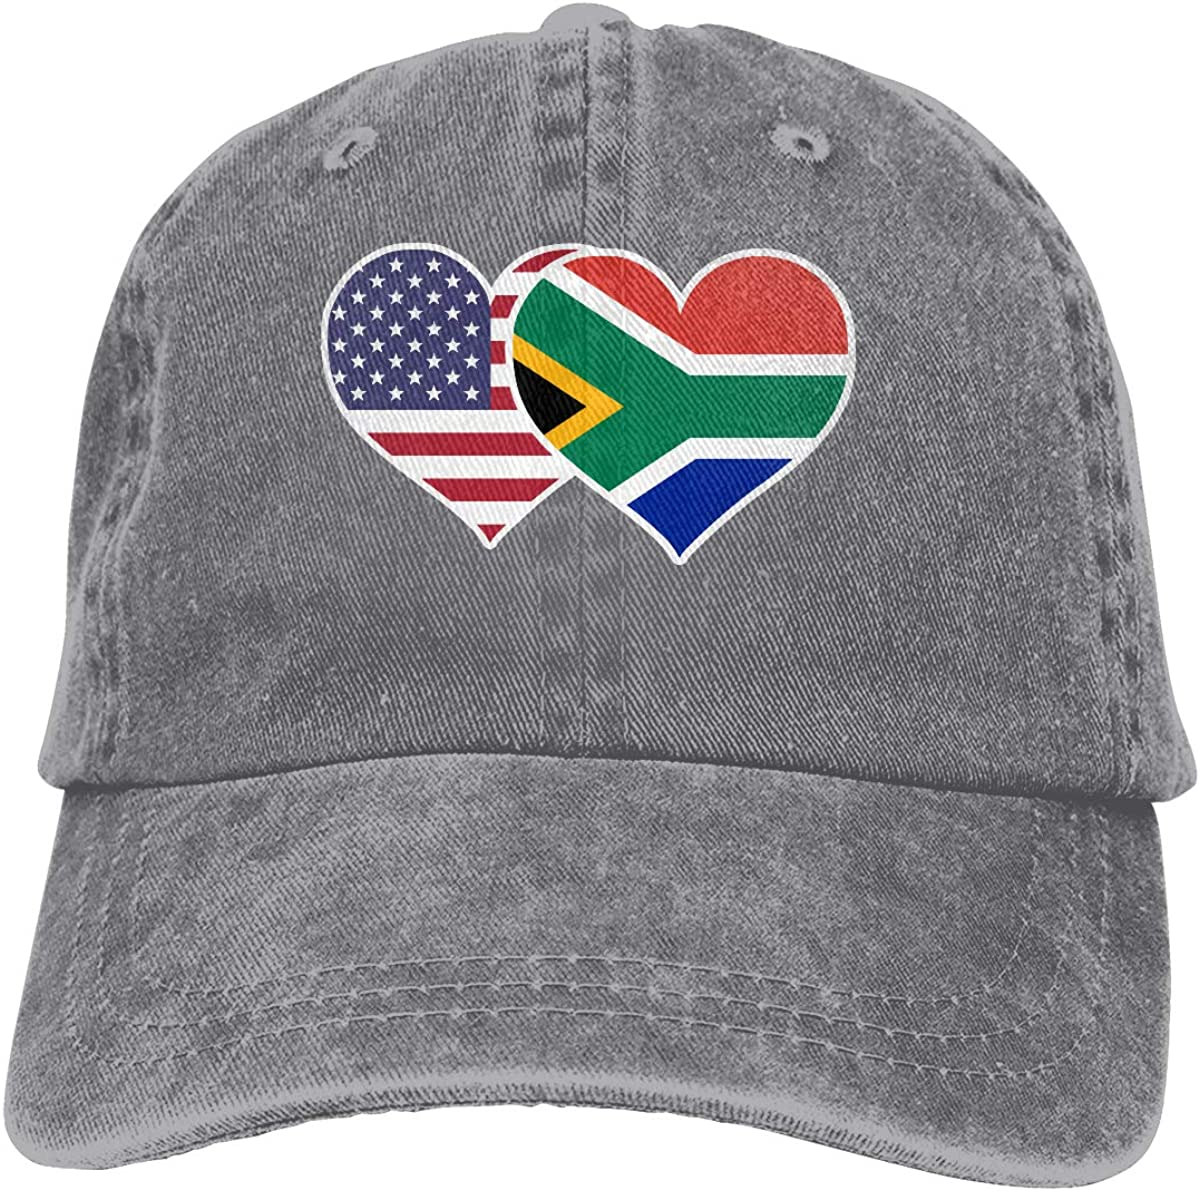 American South African Flag Heart Unisex Custom Denim Casquette Adjustable Baseball Cap